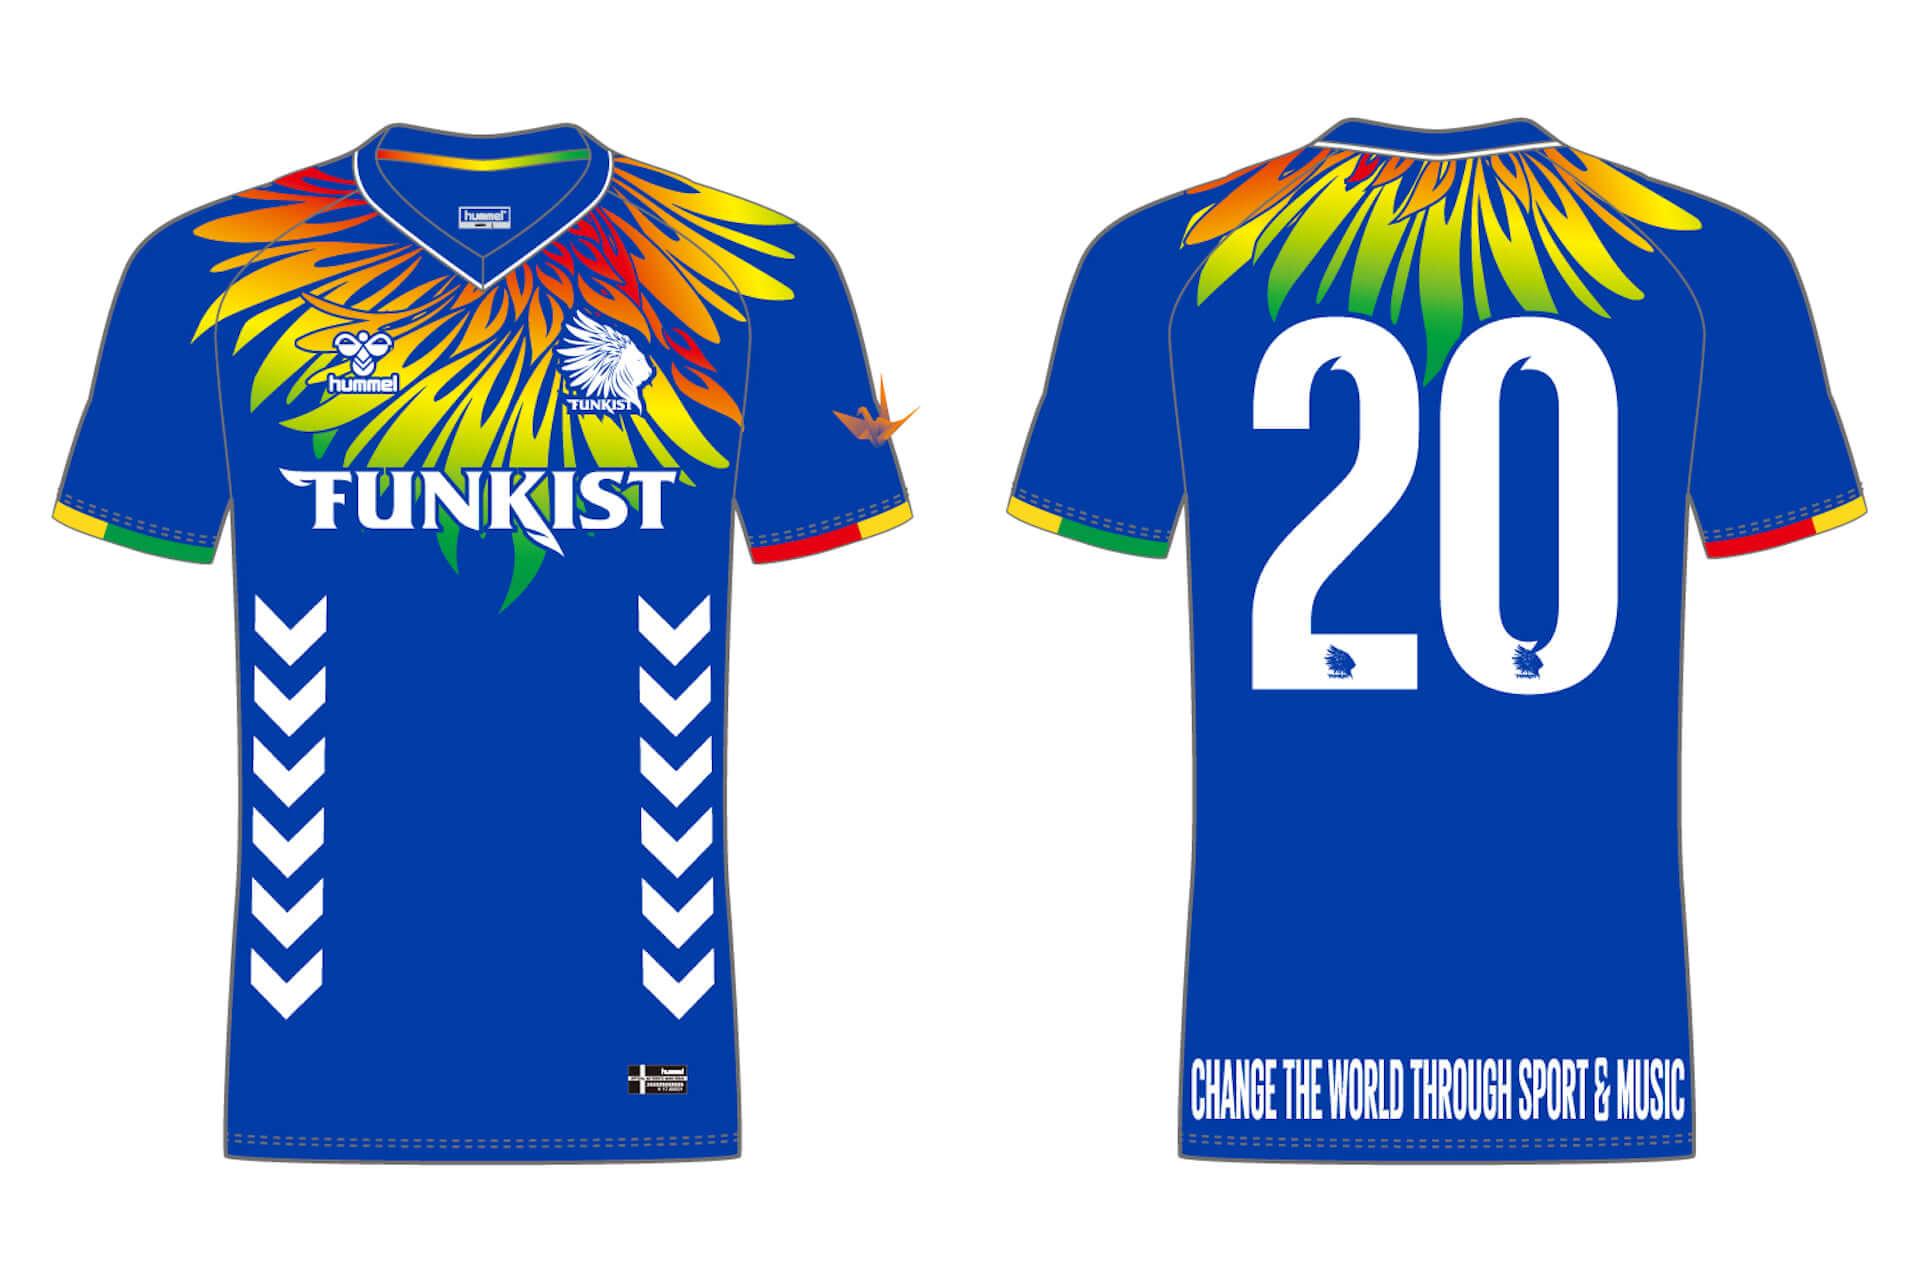 FUNKISTの20周年記念ユニフォームをヒュンメルがデザイン|売り上げの一部が南アフリカの支援に lifefashion190703funkist-hummel_8-1920x1280